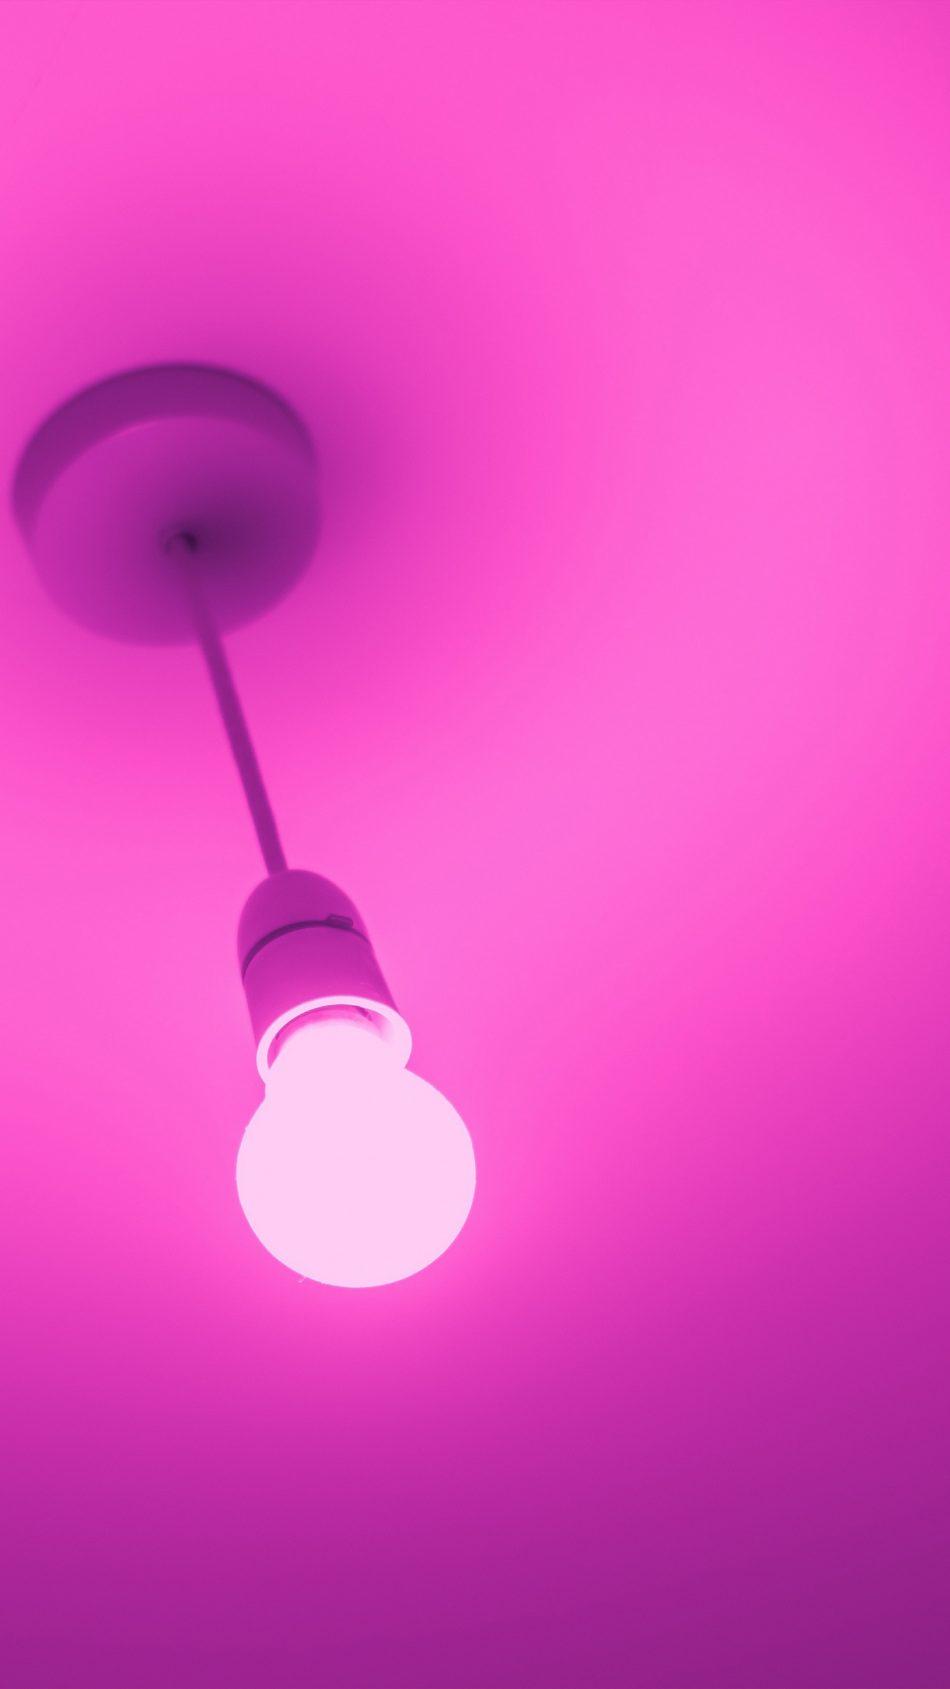 Pink Light Bulb 4k Ultra Hd Mobile Wallpaper Pink Wallpapers 4k Phone 1352265 Hd Wallpaper Backgrounds Download